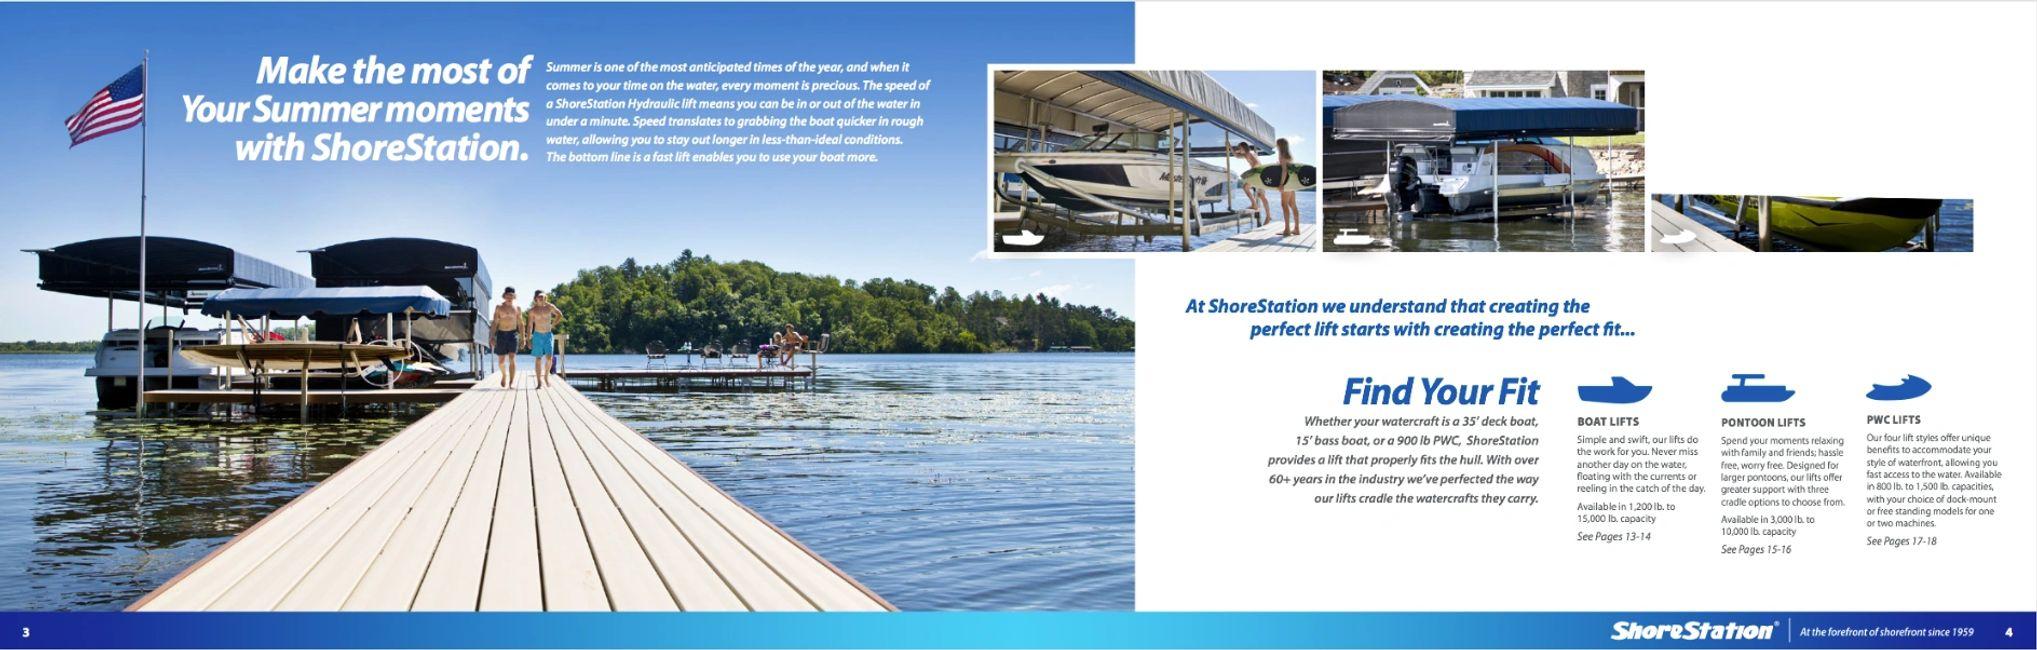 Lifts | New England Dock & Boat Lift, Inc